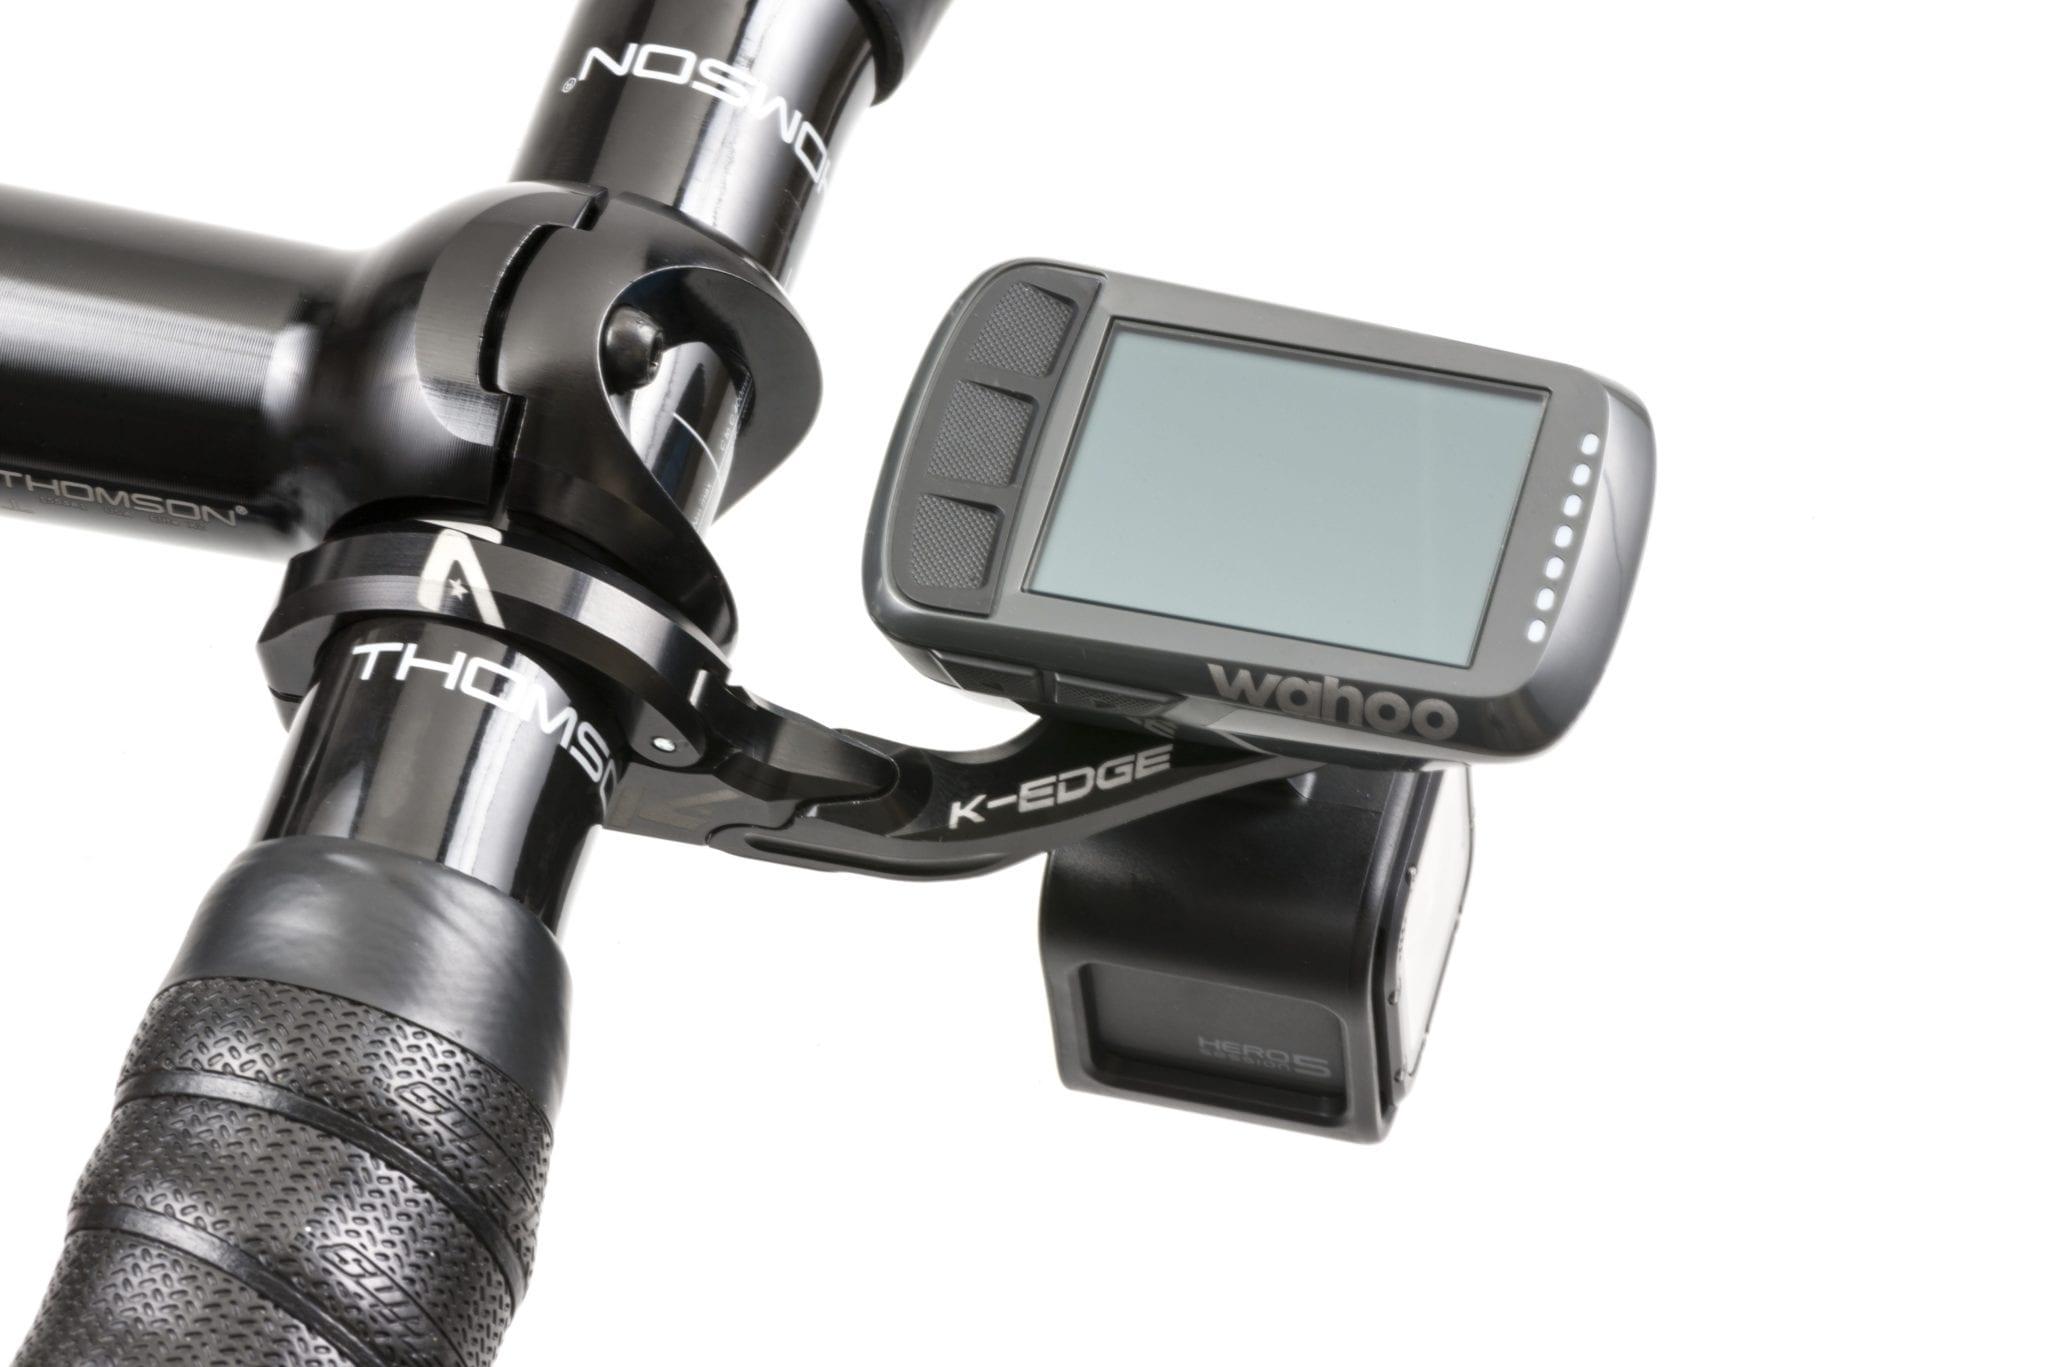 31.8mm Black K-EDGE Pro Garmin XL Combo Handlebar Mount